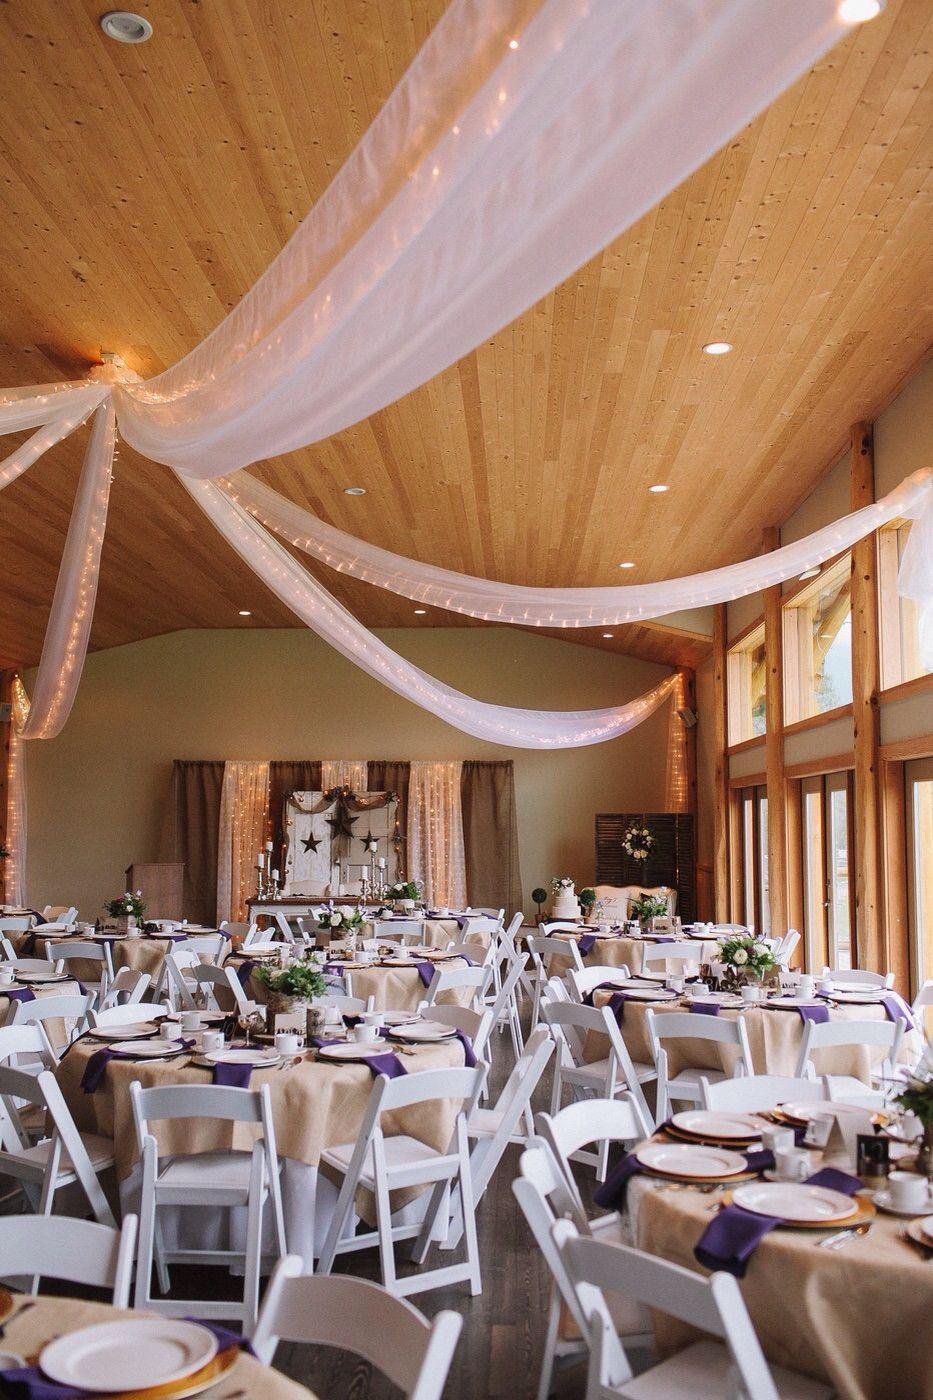 Rustic Elegant Wedding Stylist Deborah Mansell Mikaela Ruth Photography Venue Fraser River Lodge